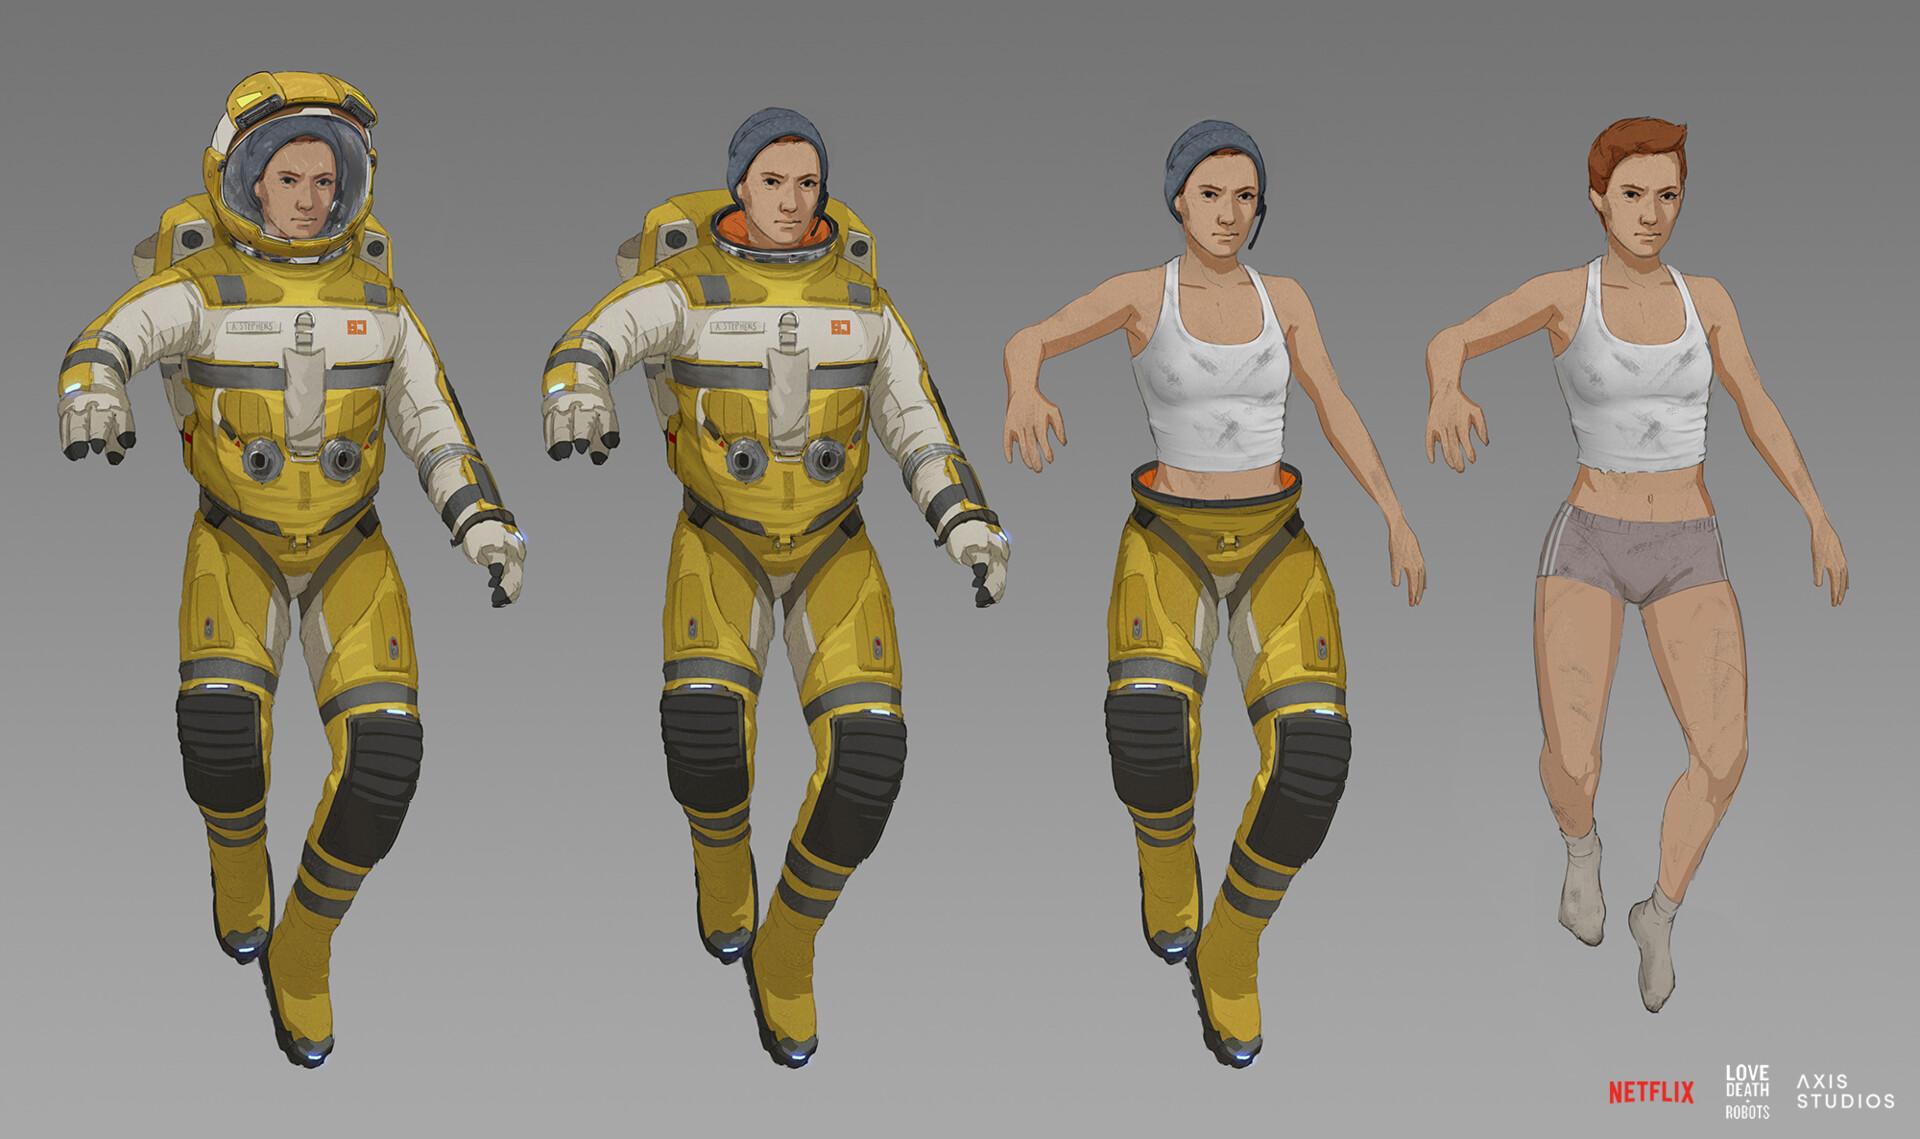 Bram sels hhd character design01 bram sels